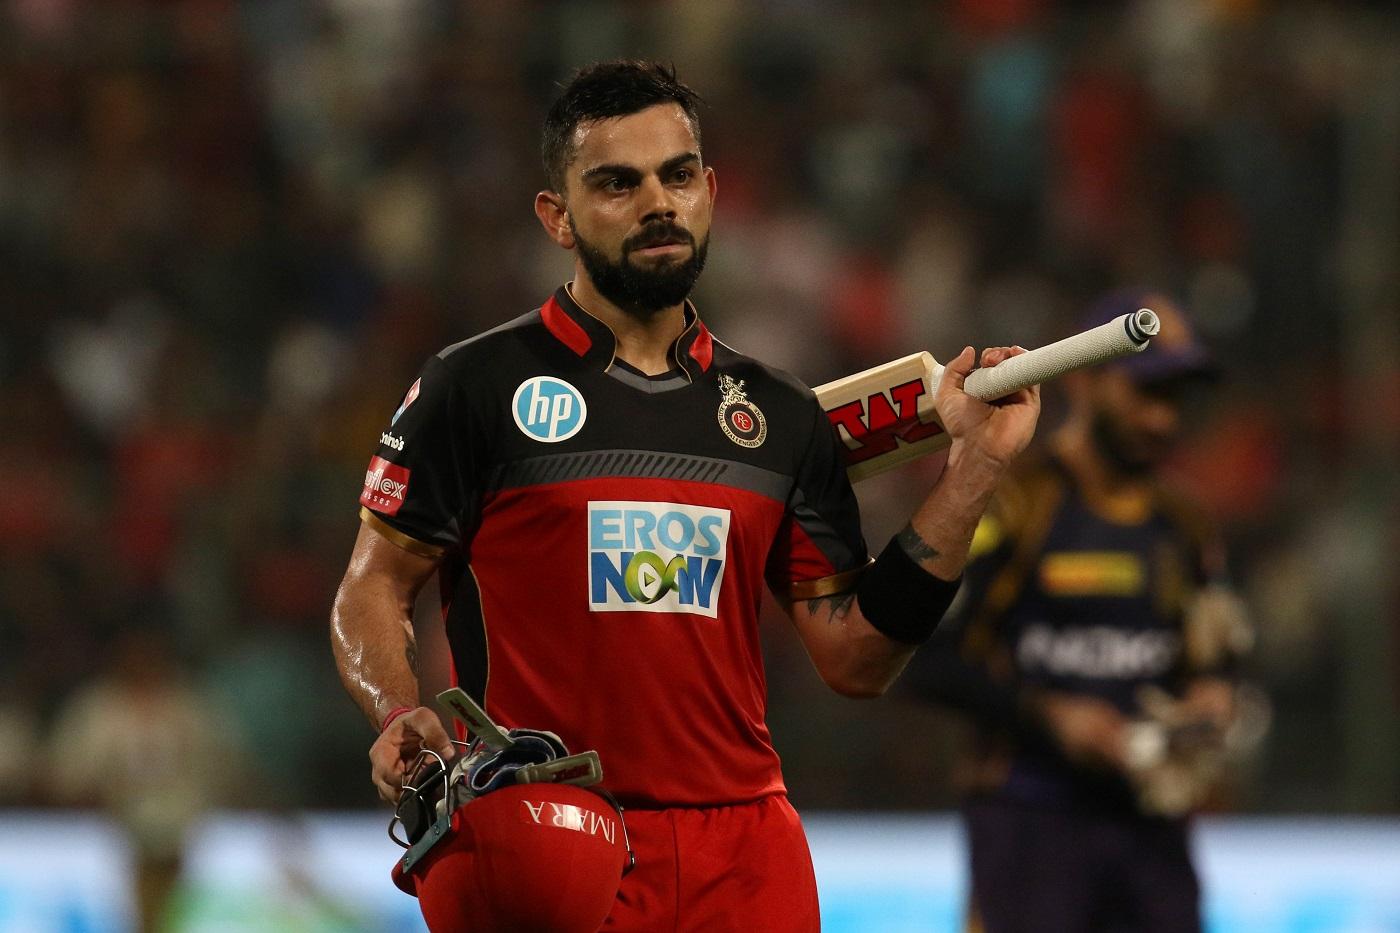 IPL 2018: If We Field Like That, We Don't Deserve To Win - Virat Kohli 1